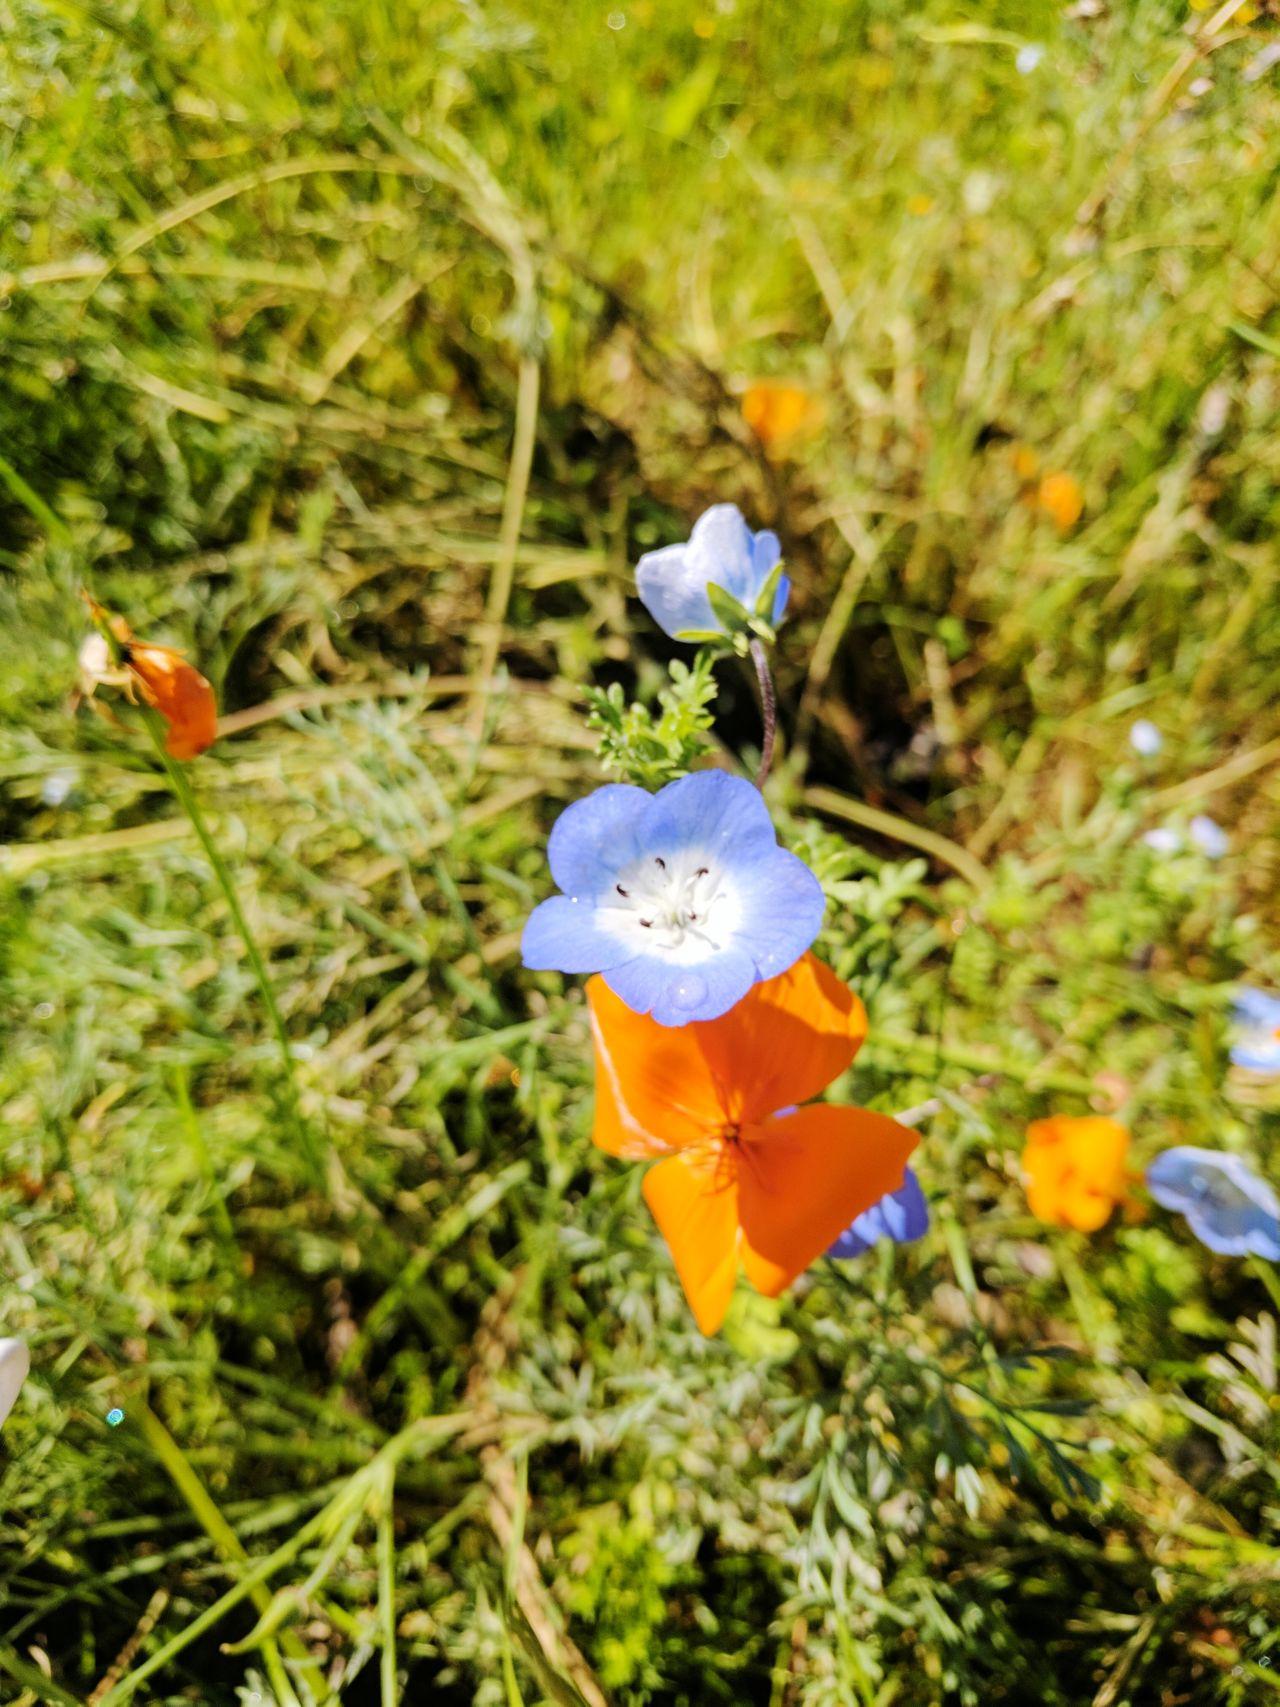 EyeEmFlower EyeEm Nature Lover Botanical Flowerporn Botany Flower Head First Eyeem Photo